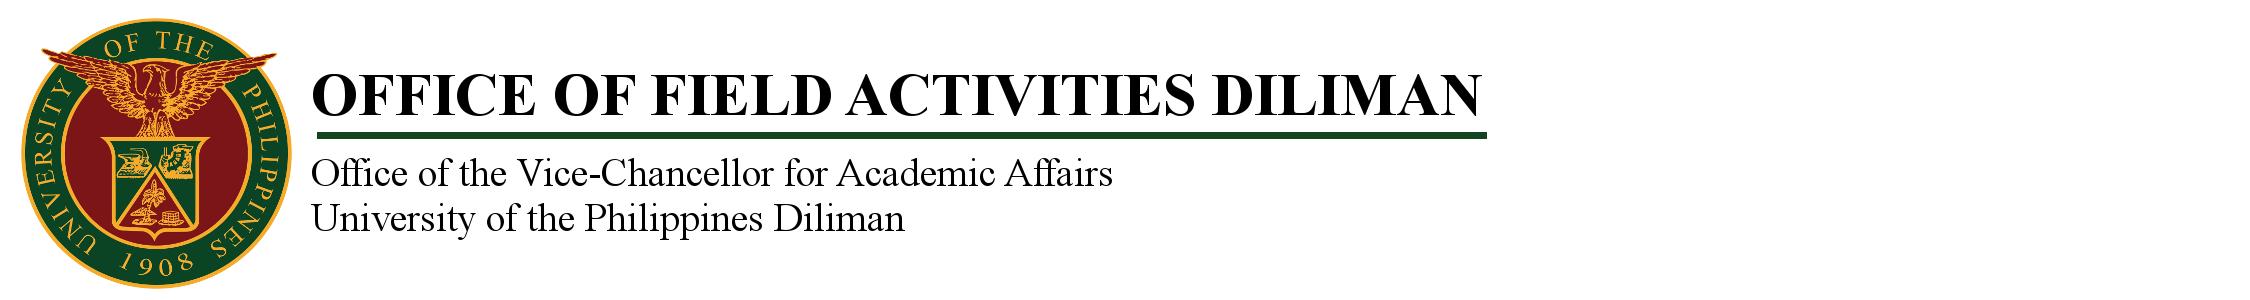 OFFICE OF FIELD ACTIVITIES